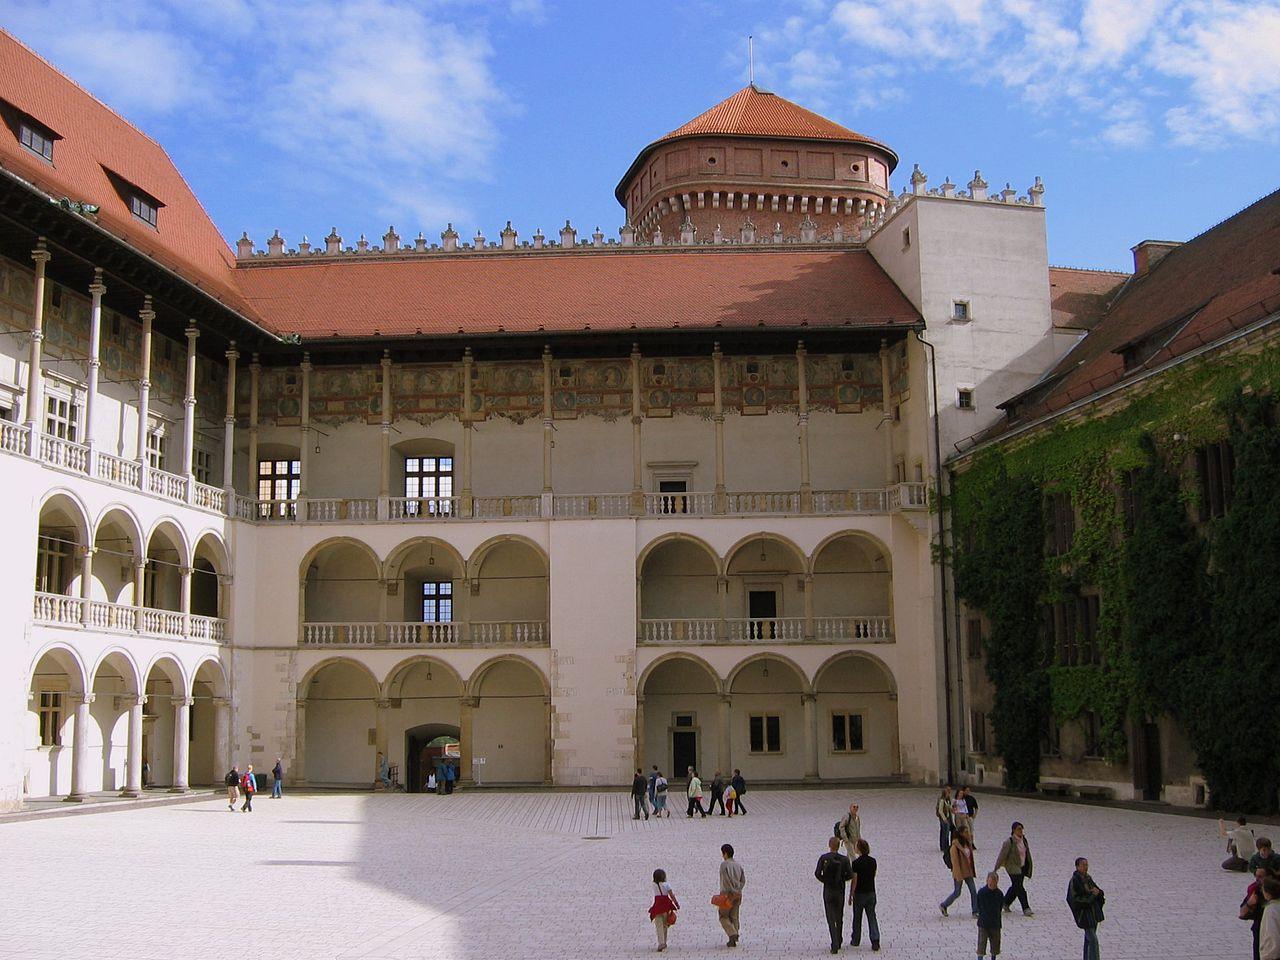 Zamek - Wawel